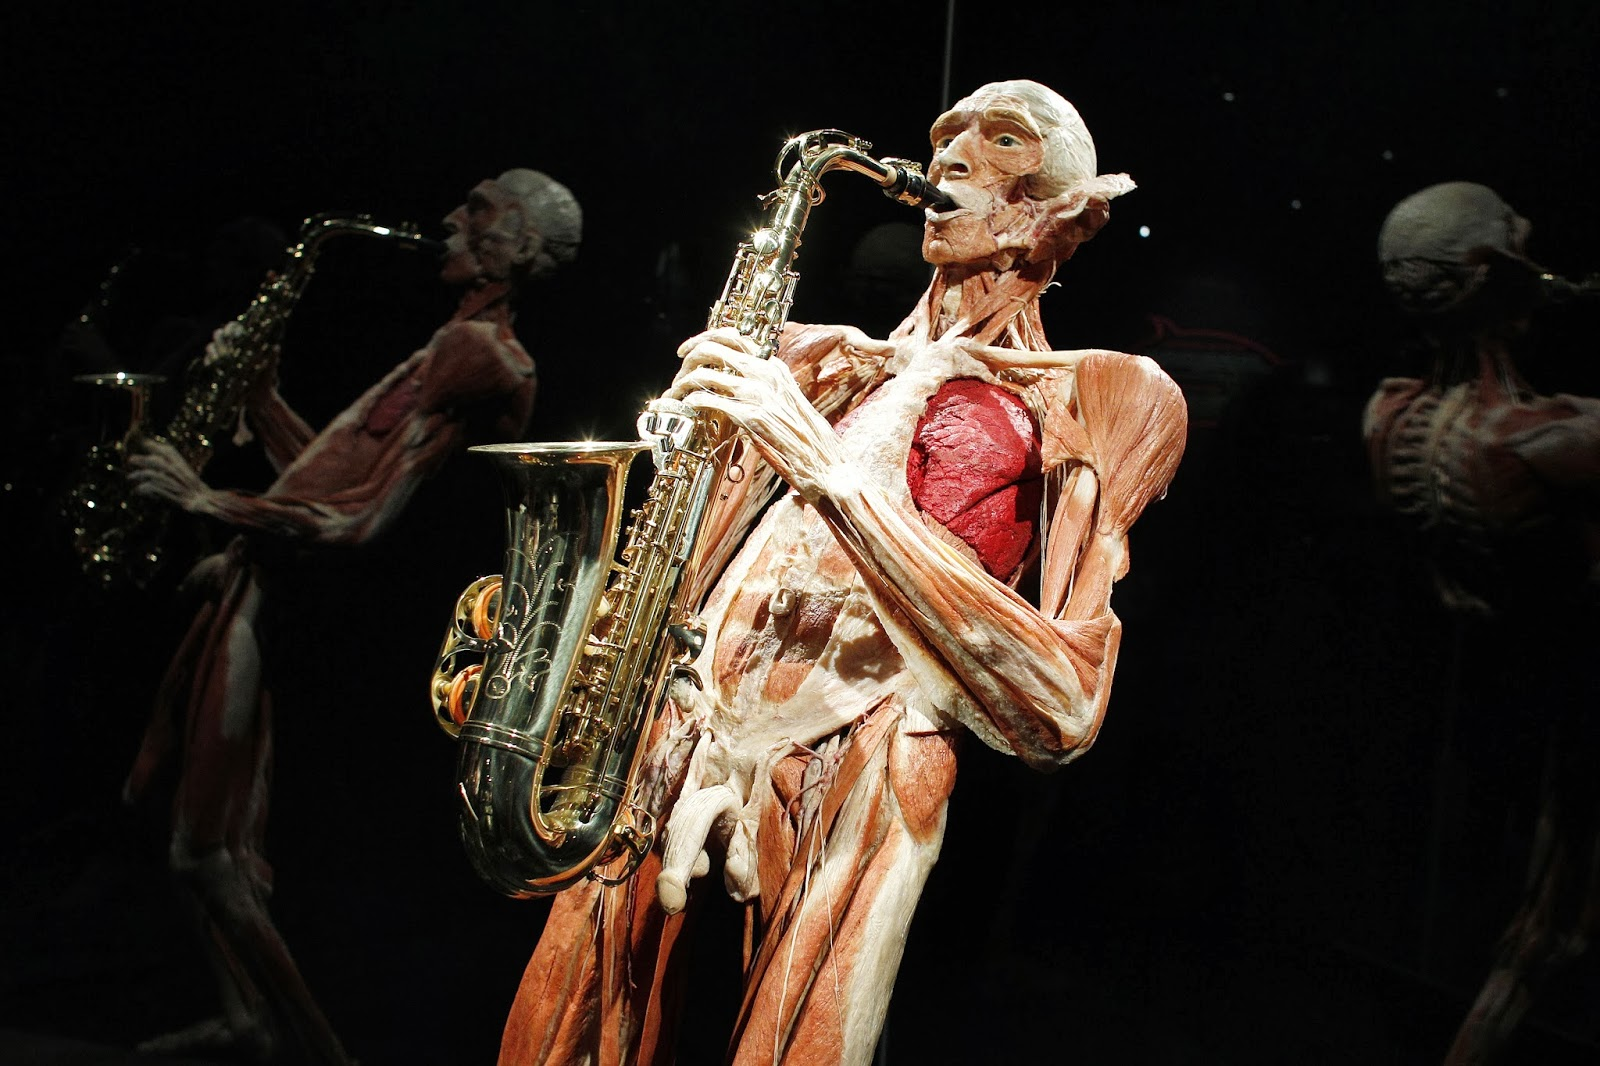 Body Worlds, Happiness, Project, Plastinated, Body, Human, Exhibition, Permanent, German,  Anatomist, Inventor, Technique, Gunther von Hagens, Amsterdam, Creation, Offbeat, Museum, Creator,